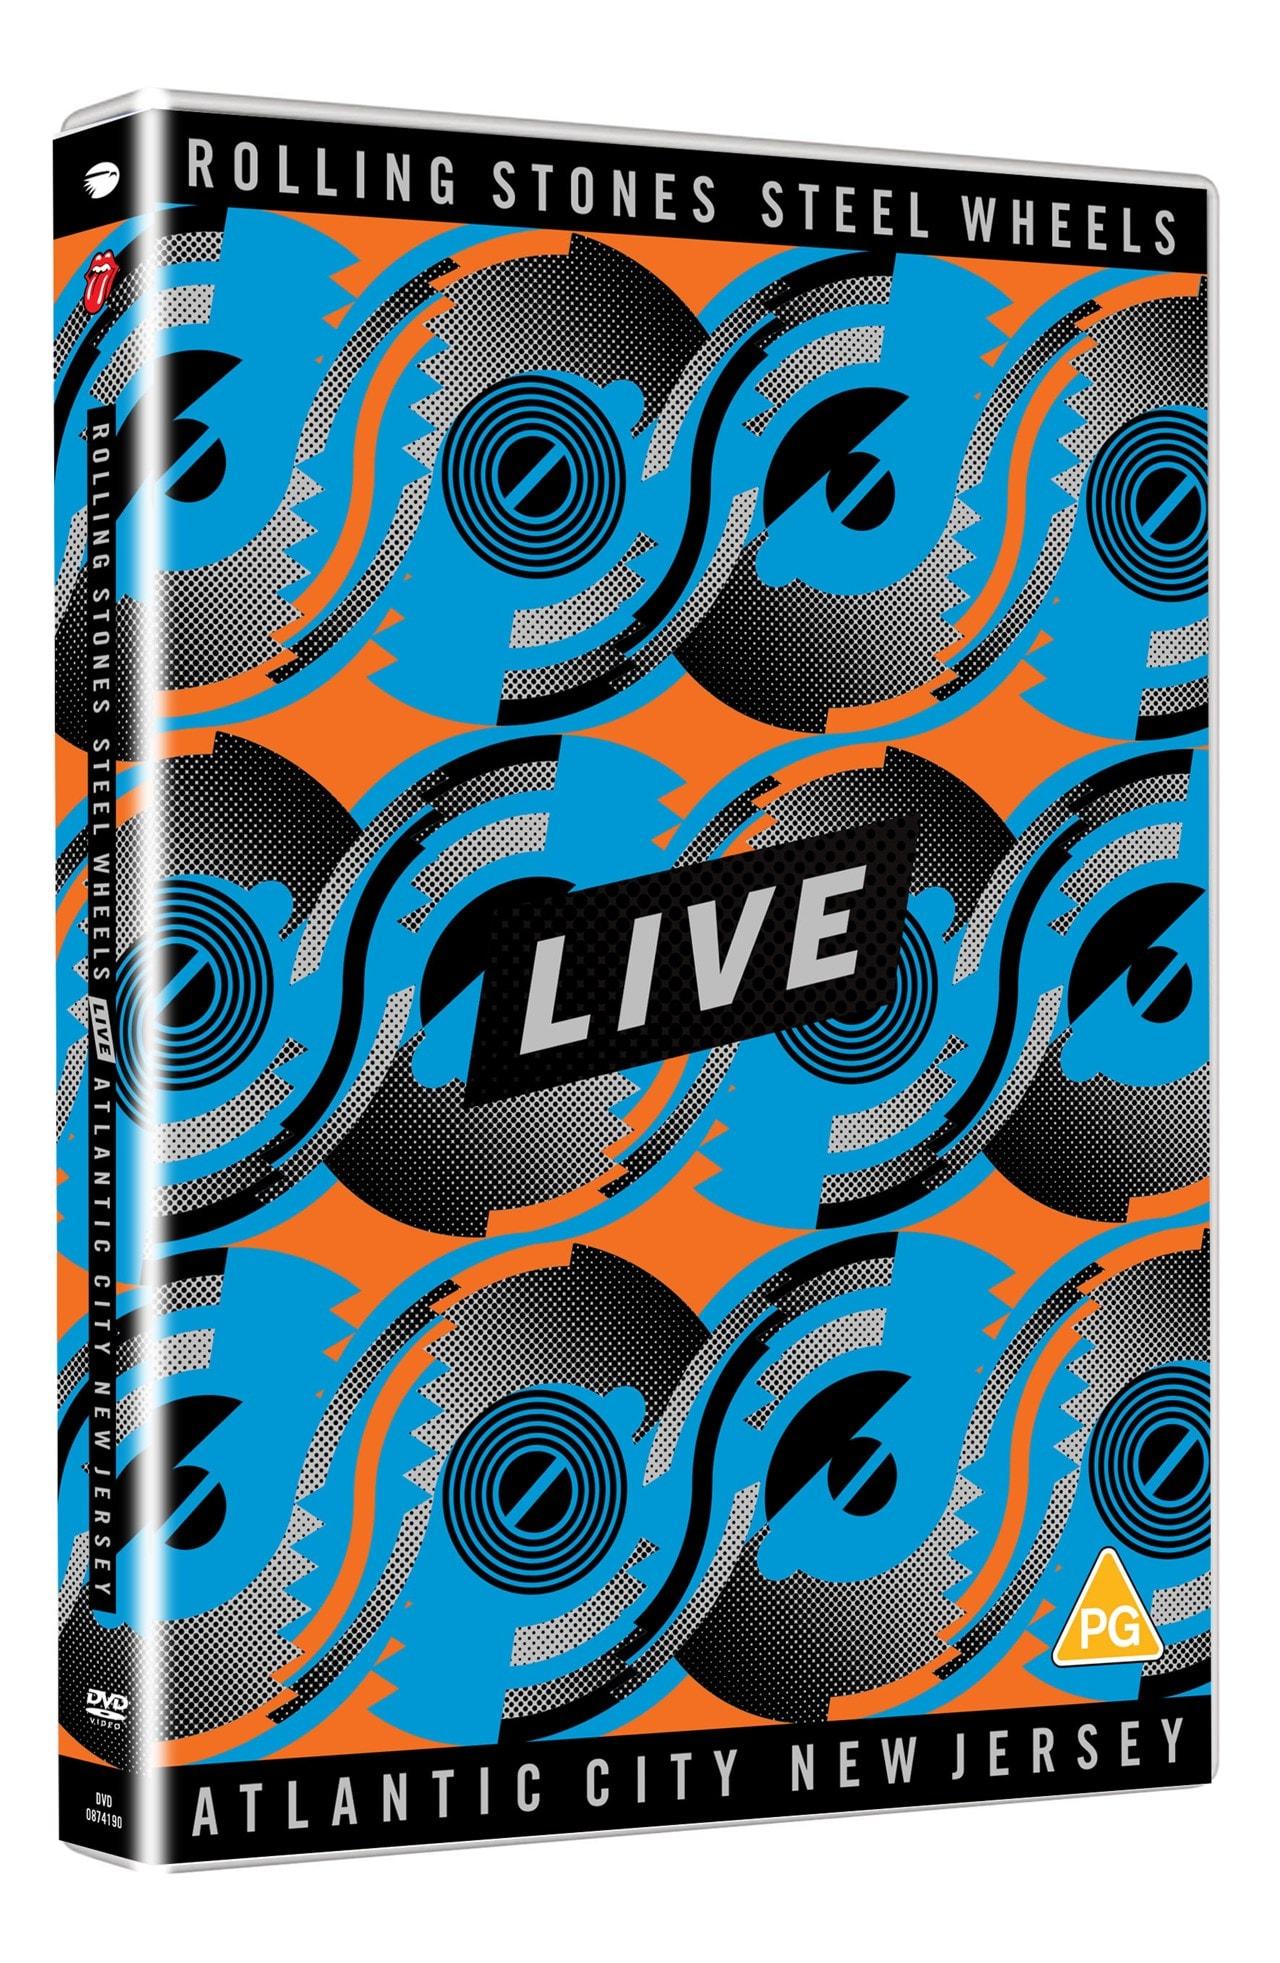 The Rolling Stones: Steel Wheels Live - Atlantic City, New Jersey - 1